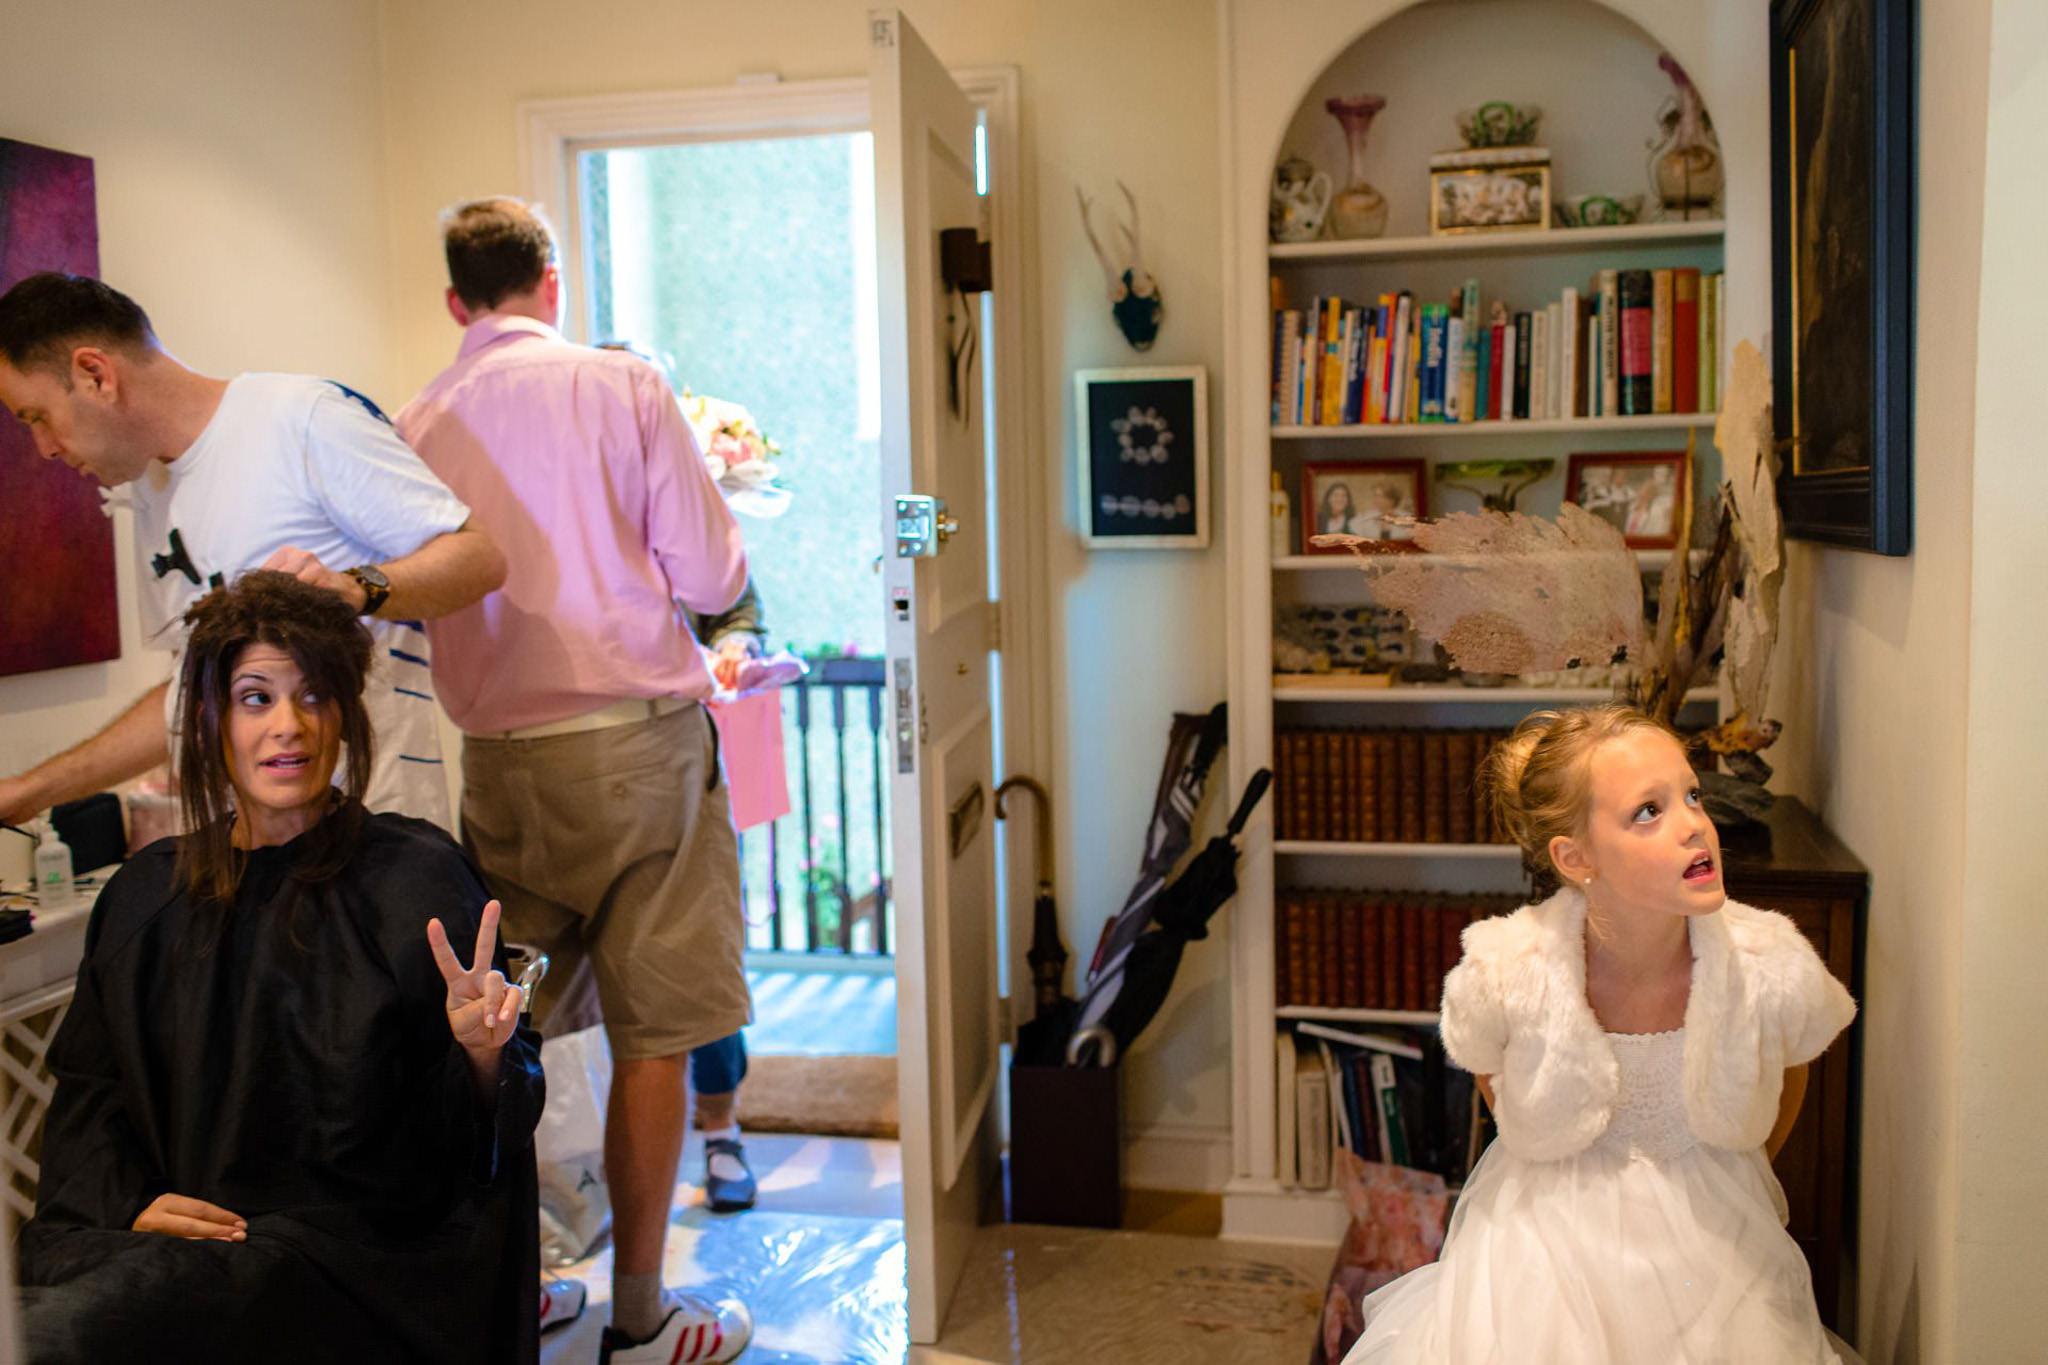 St. Pancras Renaissance hotel wedding bride final touches